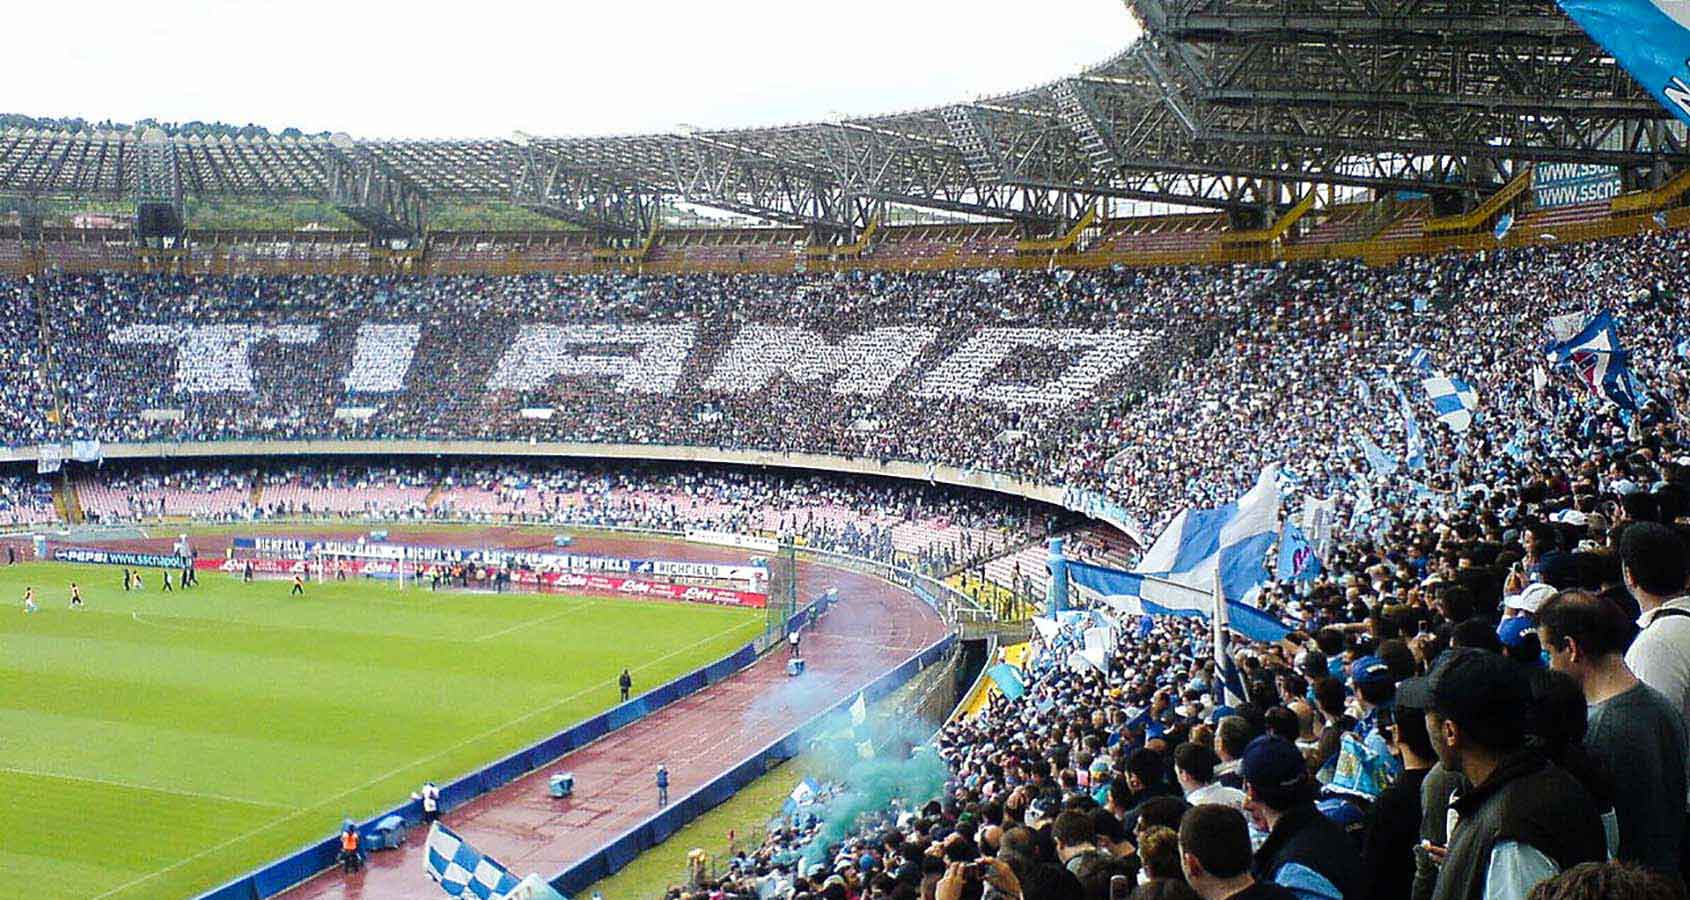 Fotbollsresor, Napoli Biljetter, Neapel, Italien, Serie A, Sao Paolo Stadion